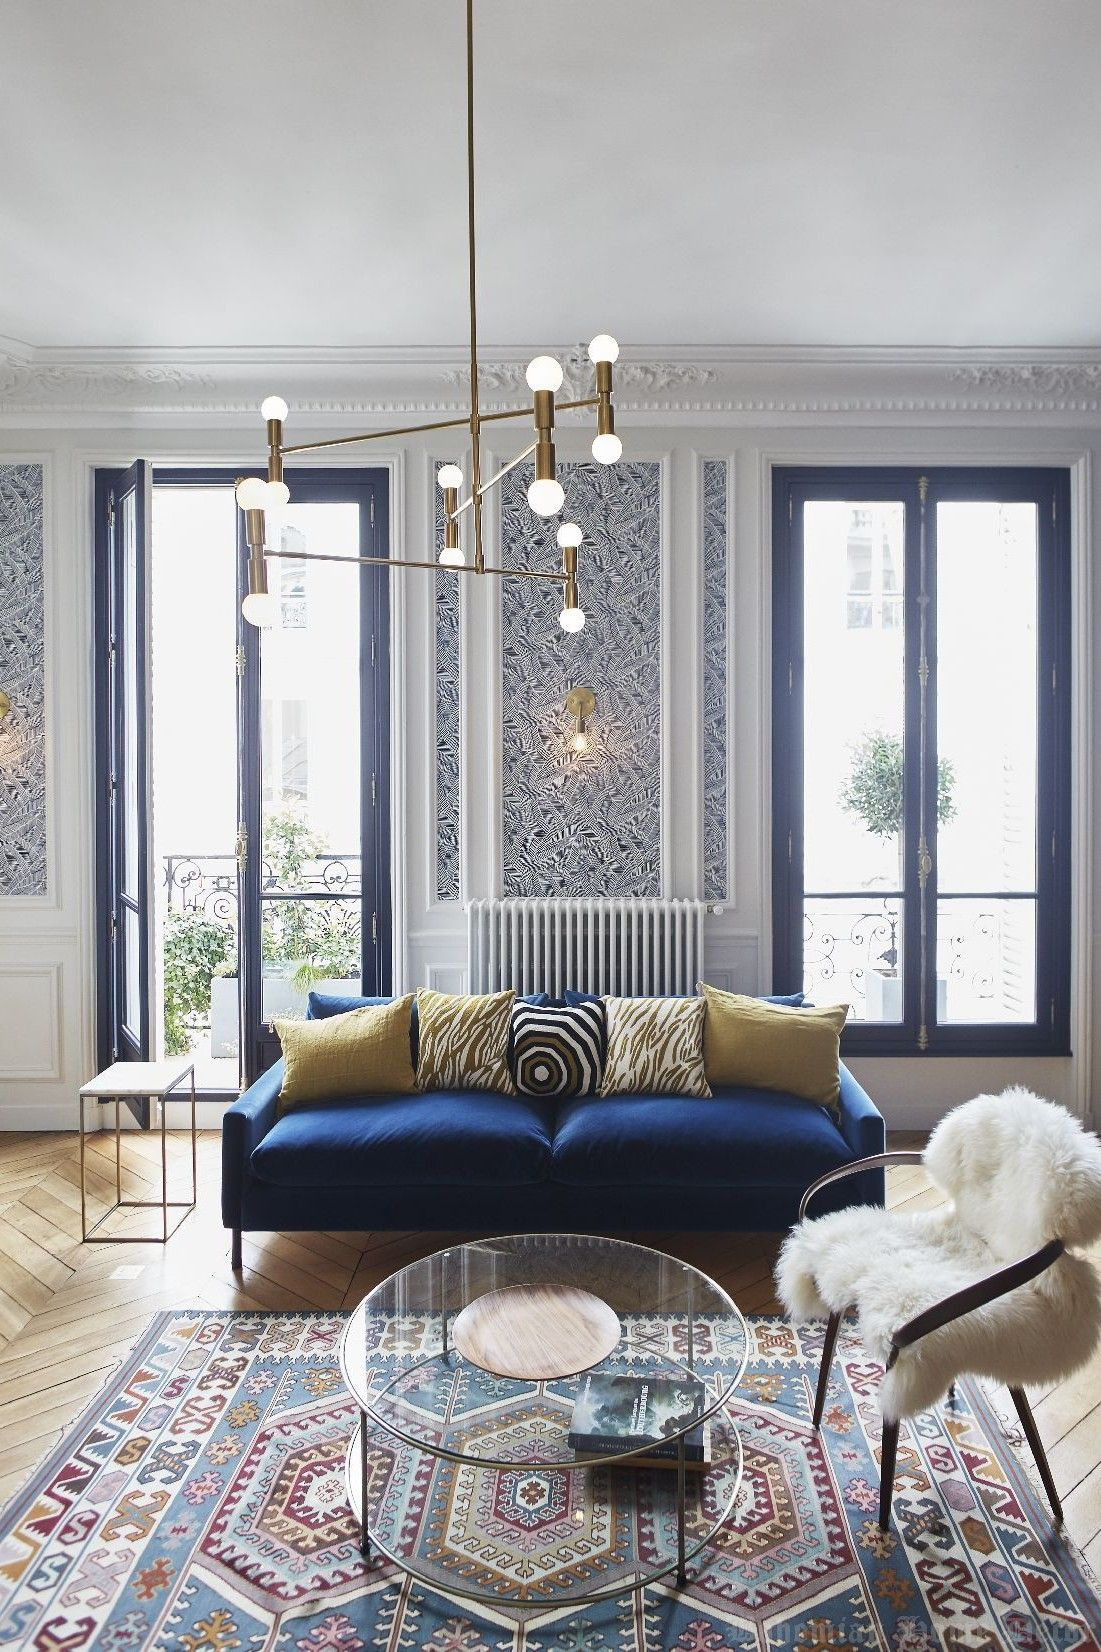 Bohemian Home Decor: Back To Basics